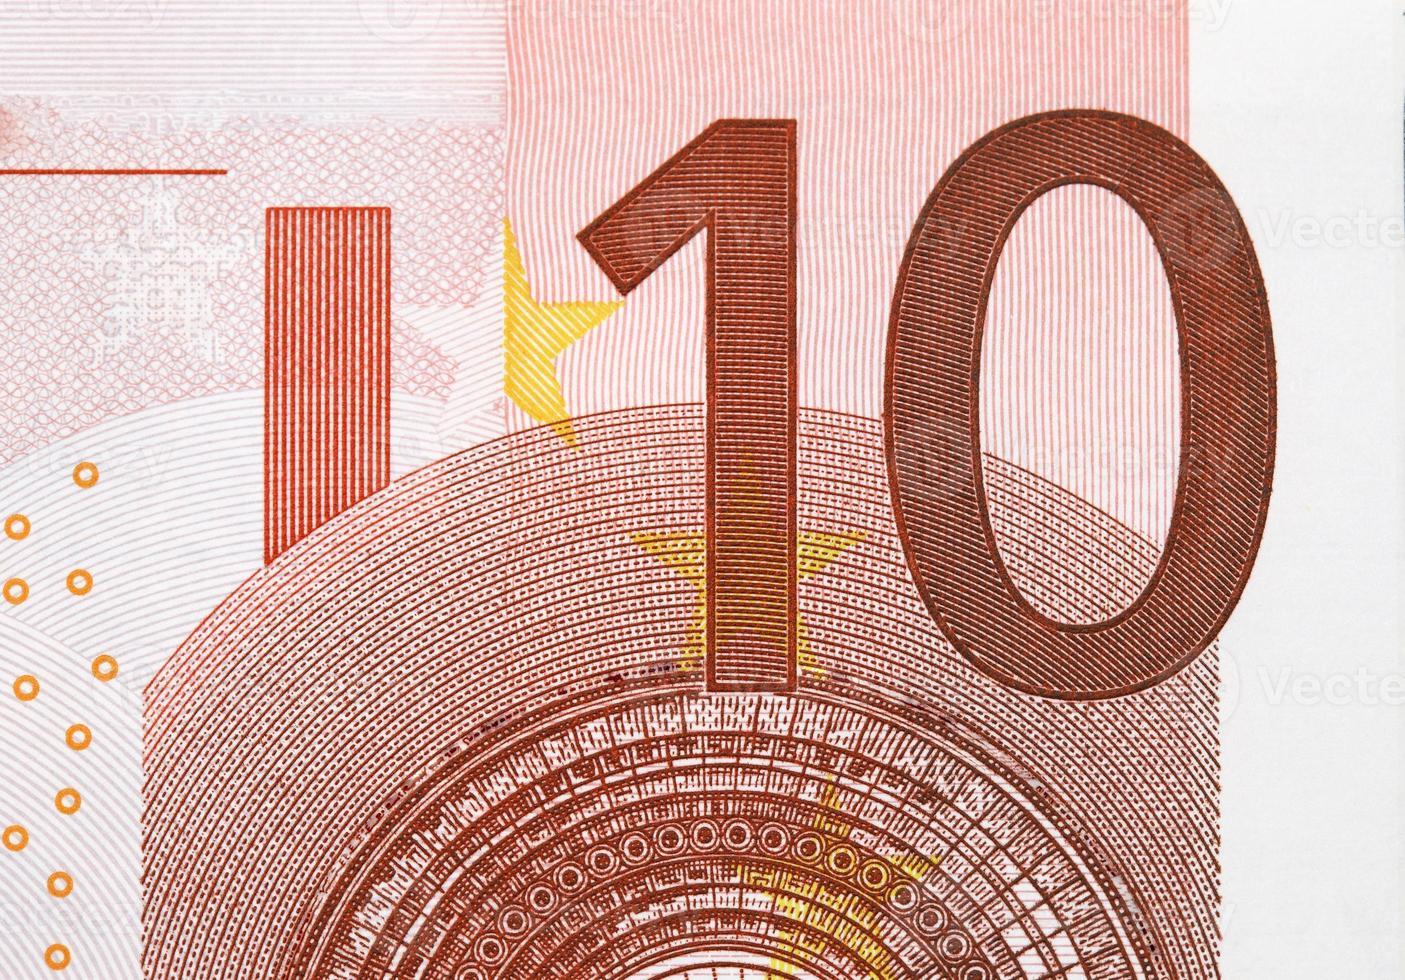 ten euros photo